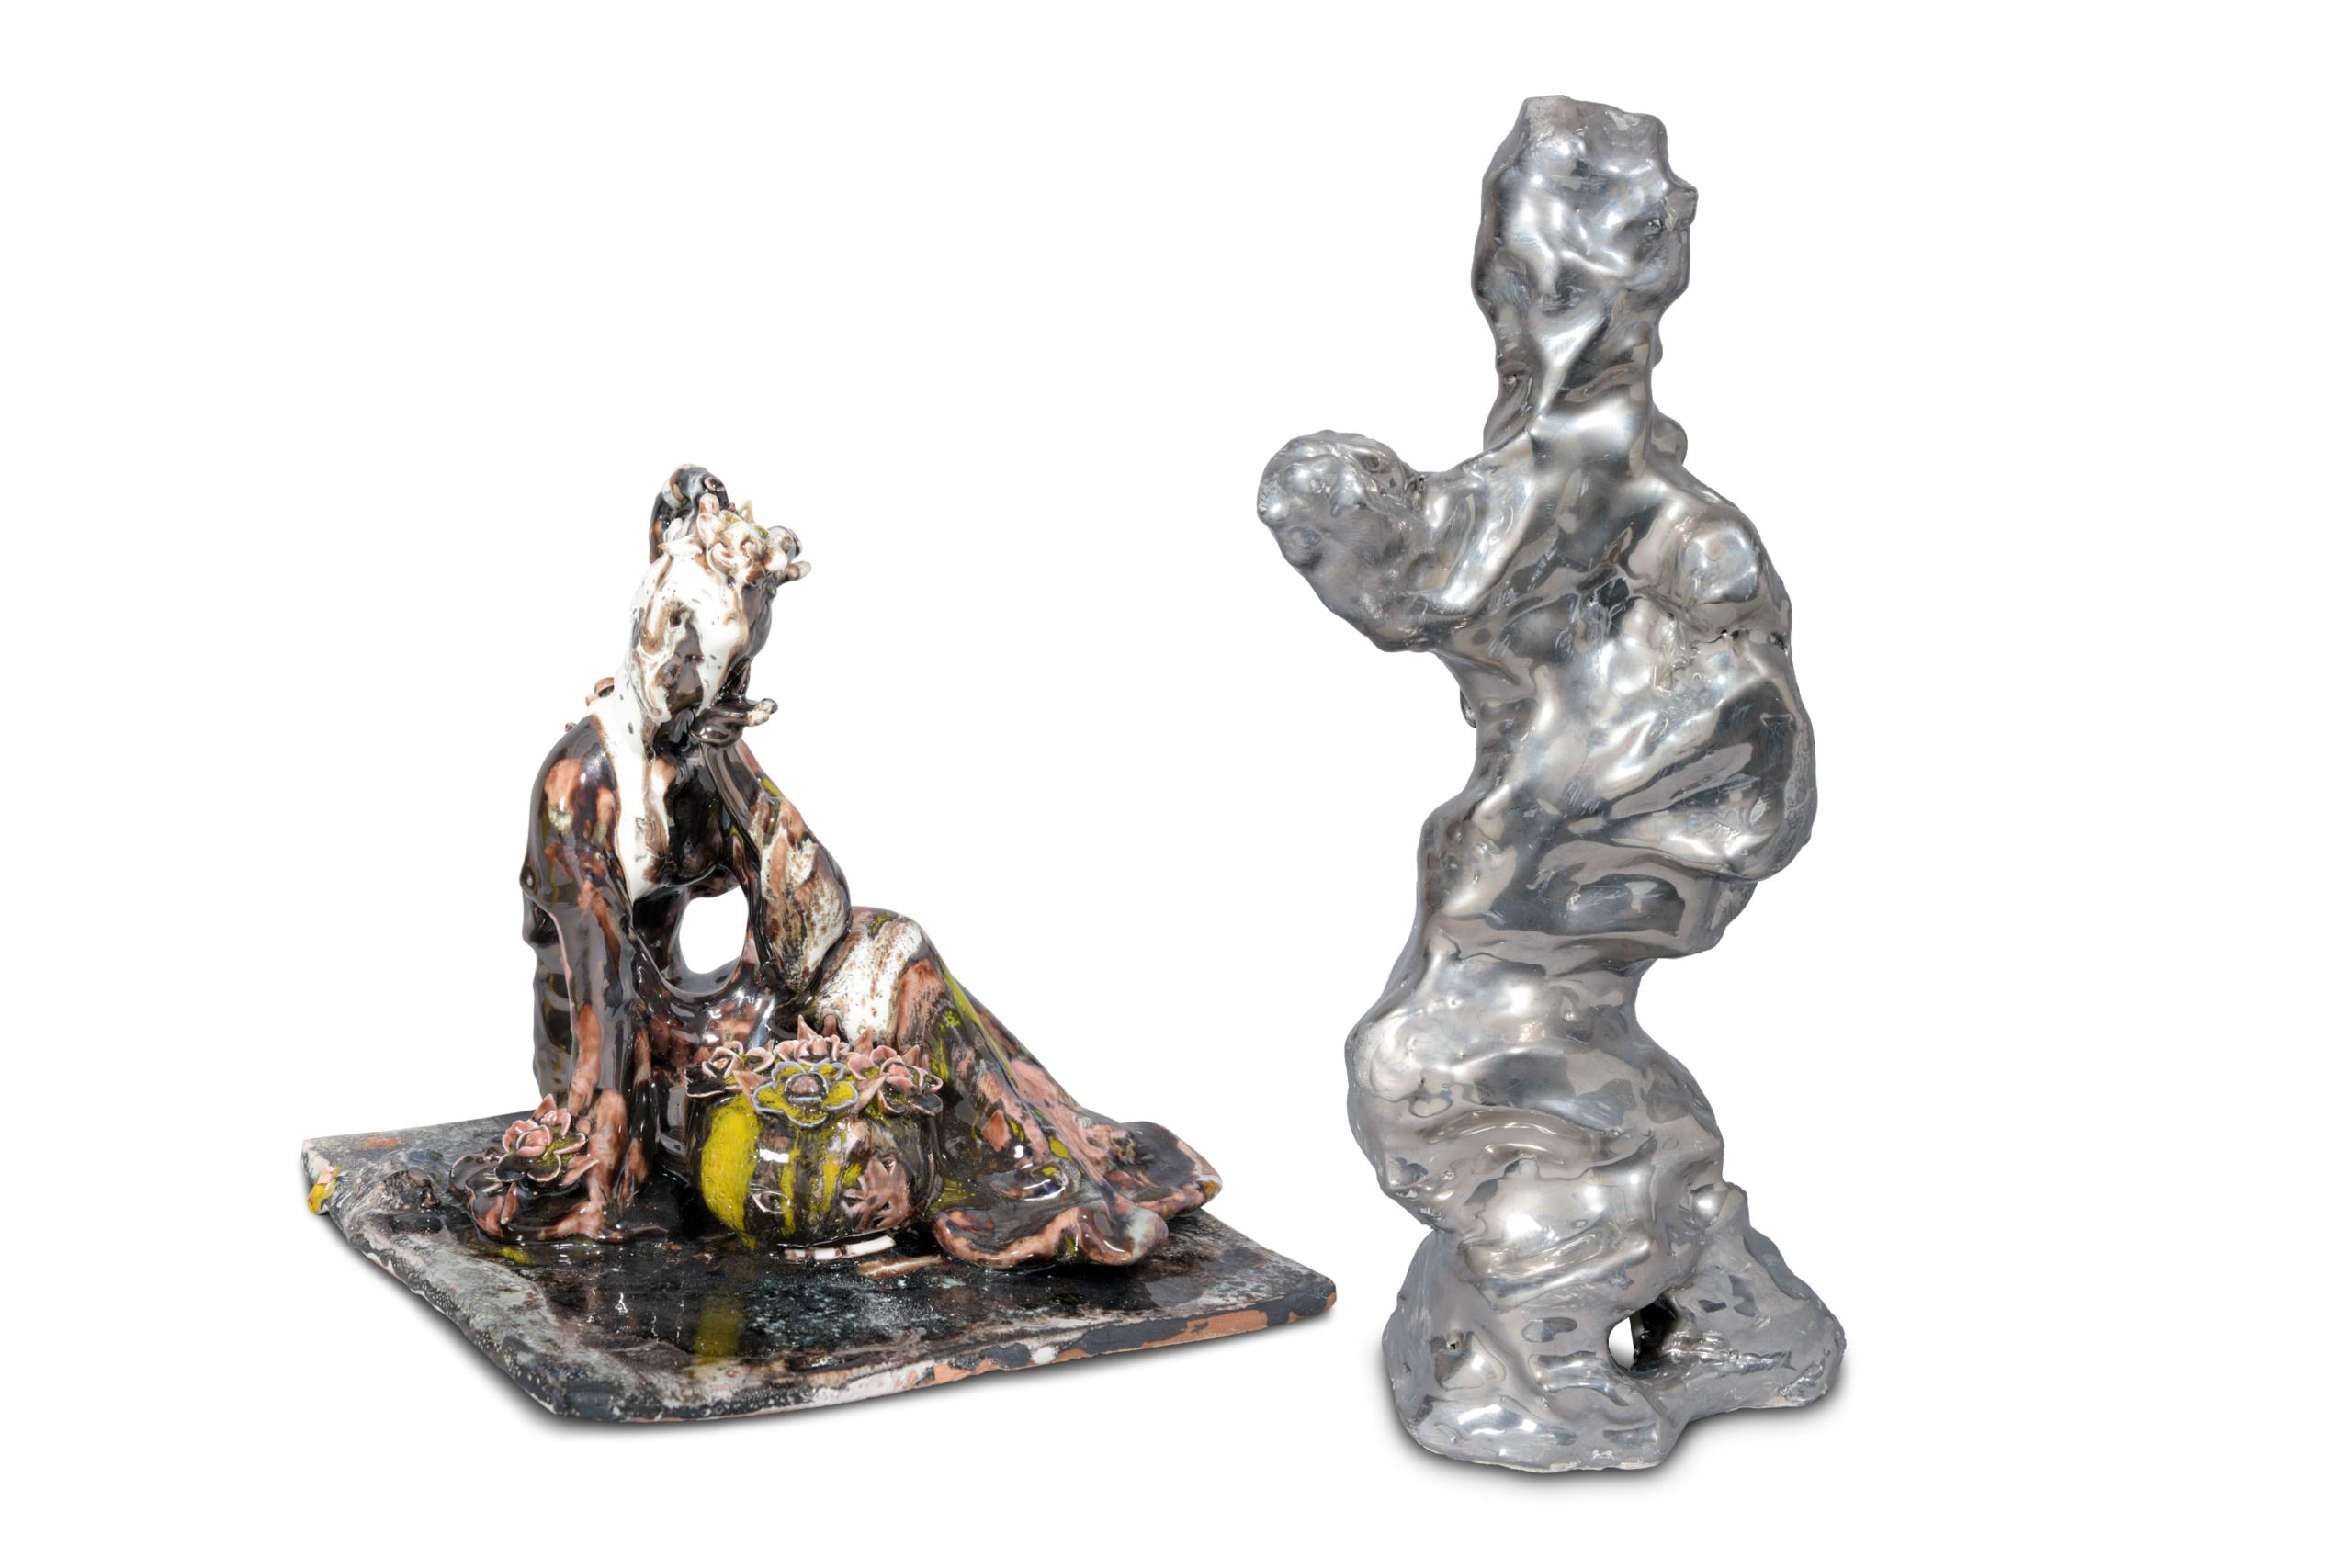 xavier toubes descriptions without a place –galerie-metzger –ceramic art object –keramik kaufen gallery plastische arbeit skulptur